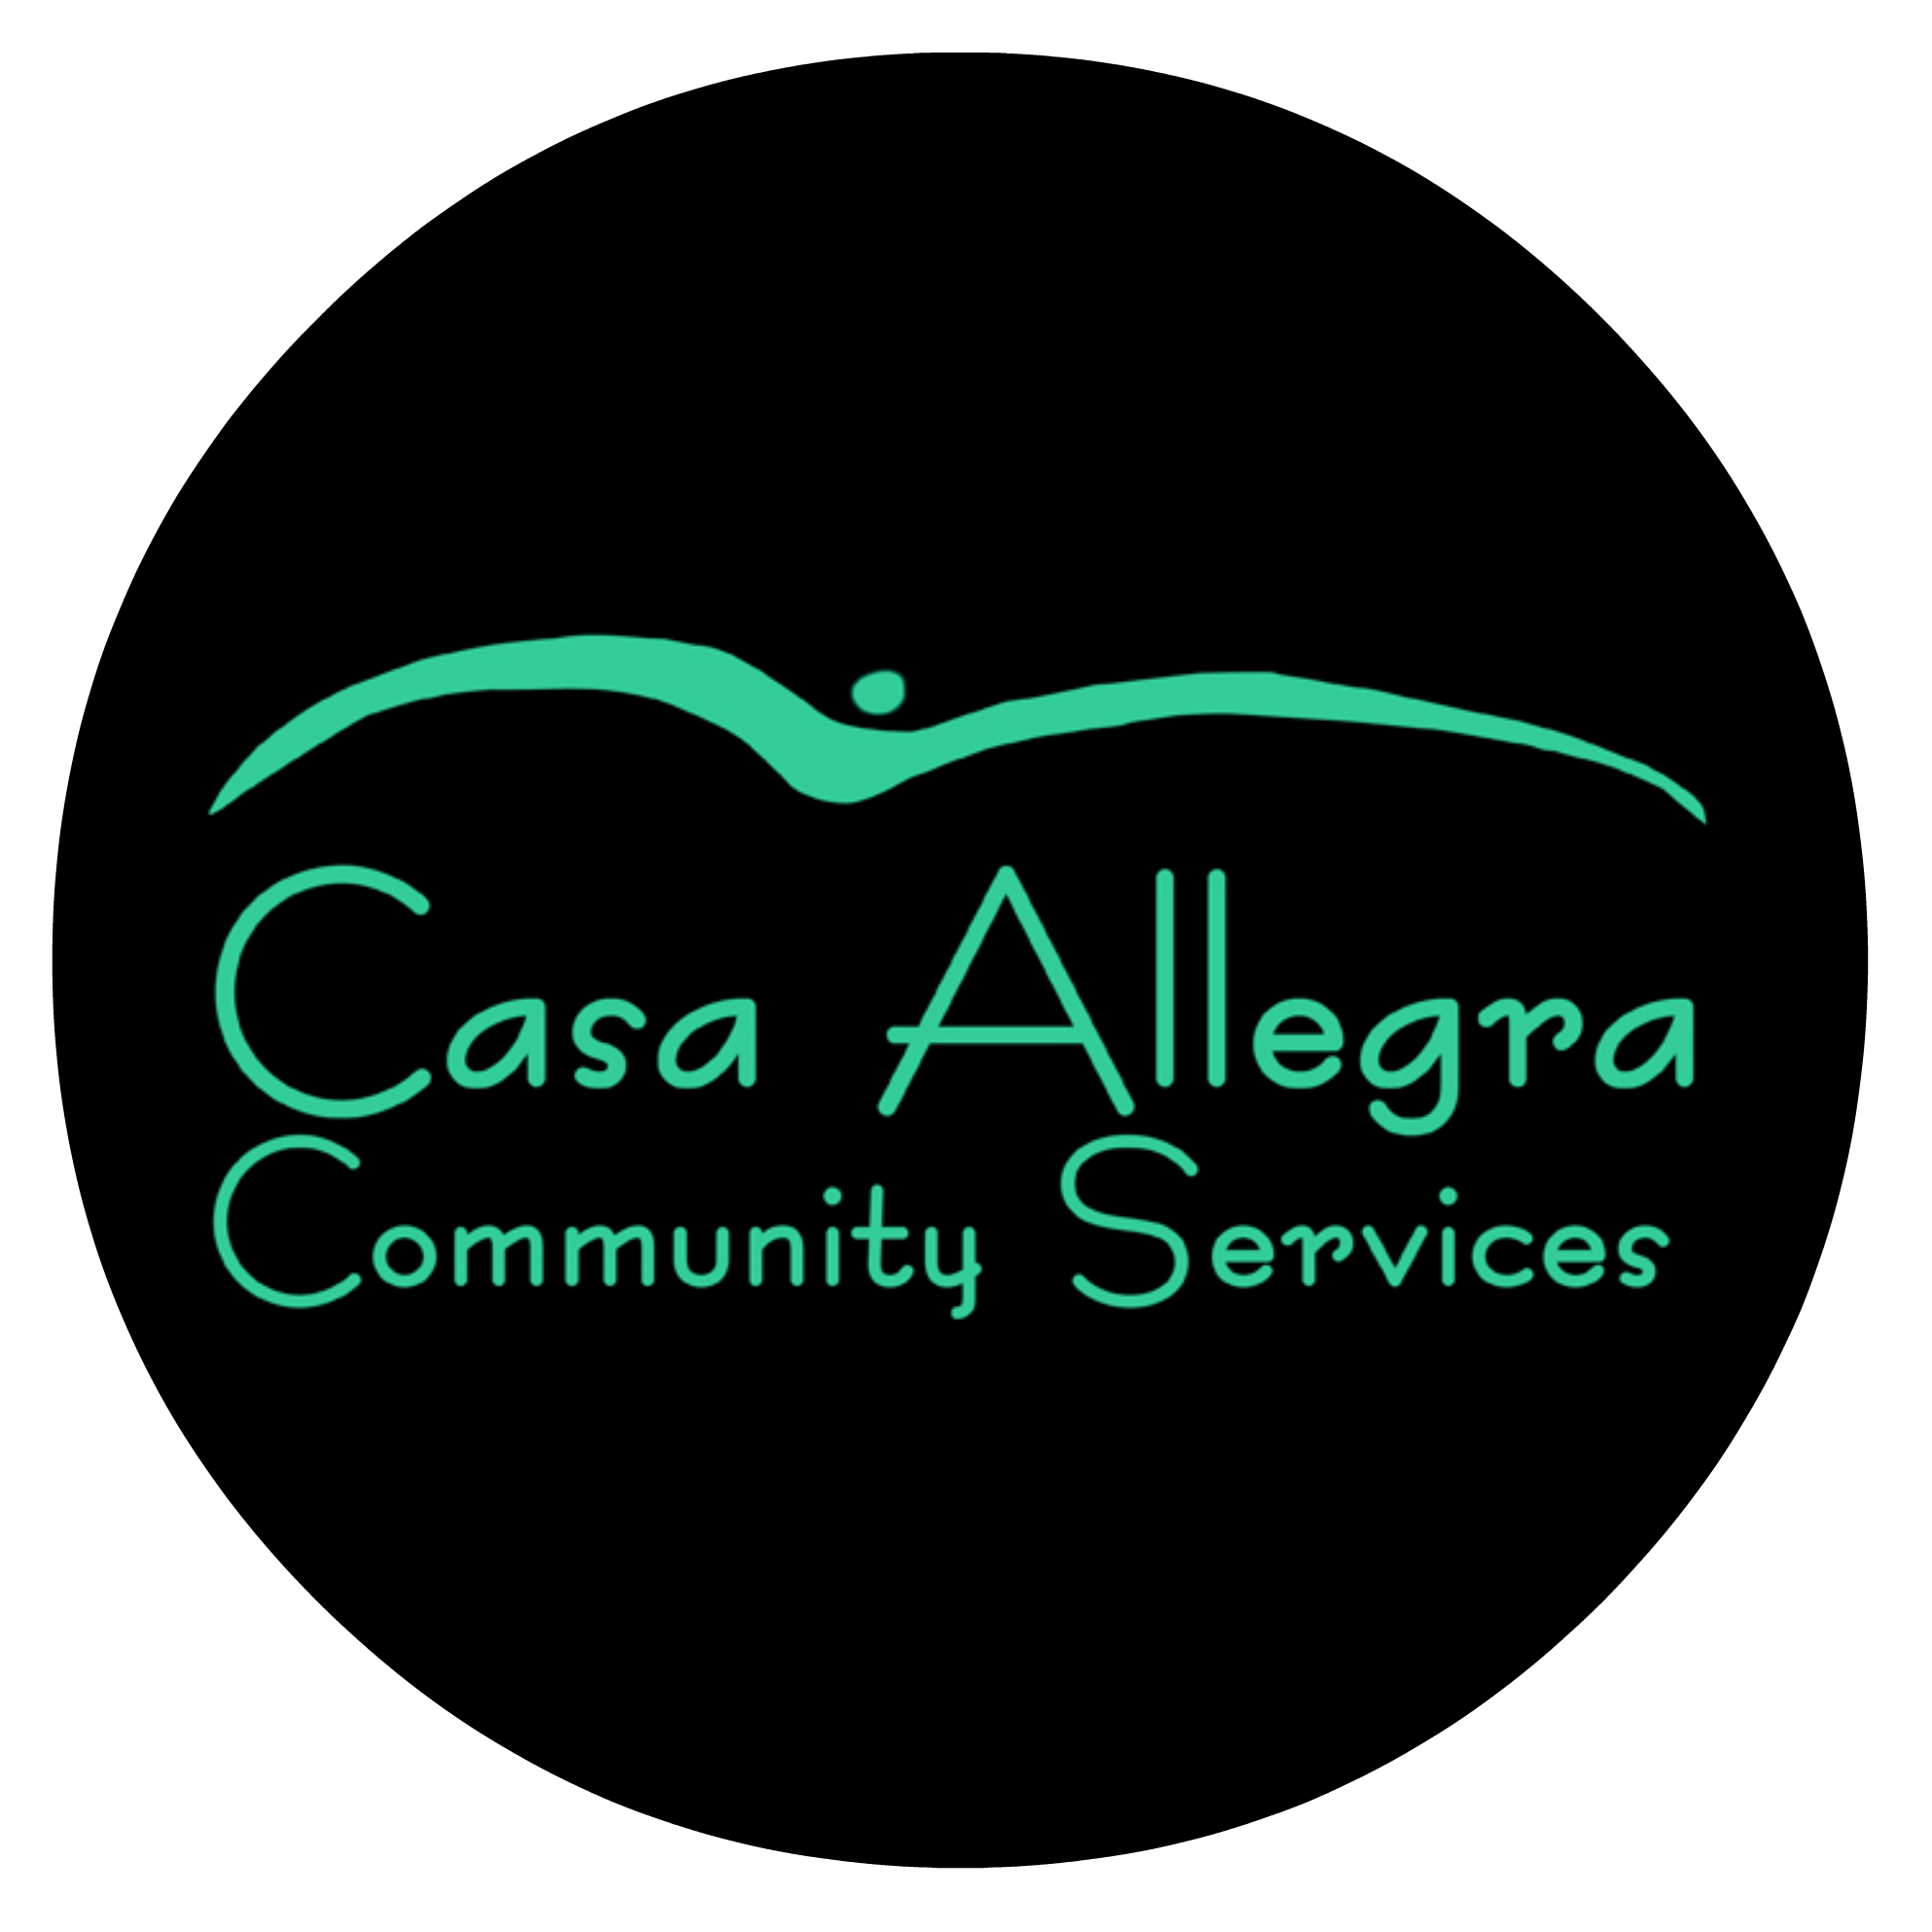 Casa Allegra Community Services (CACS)